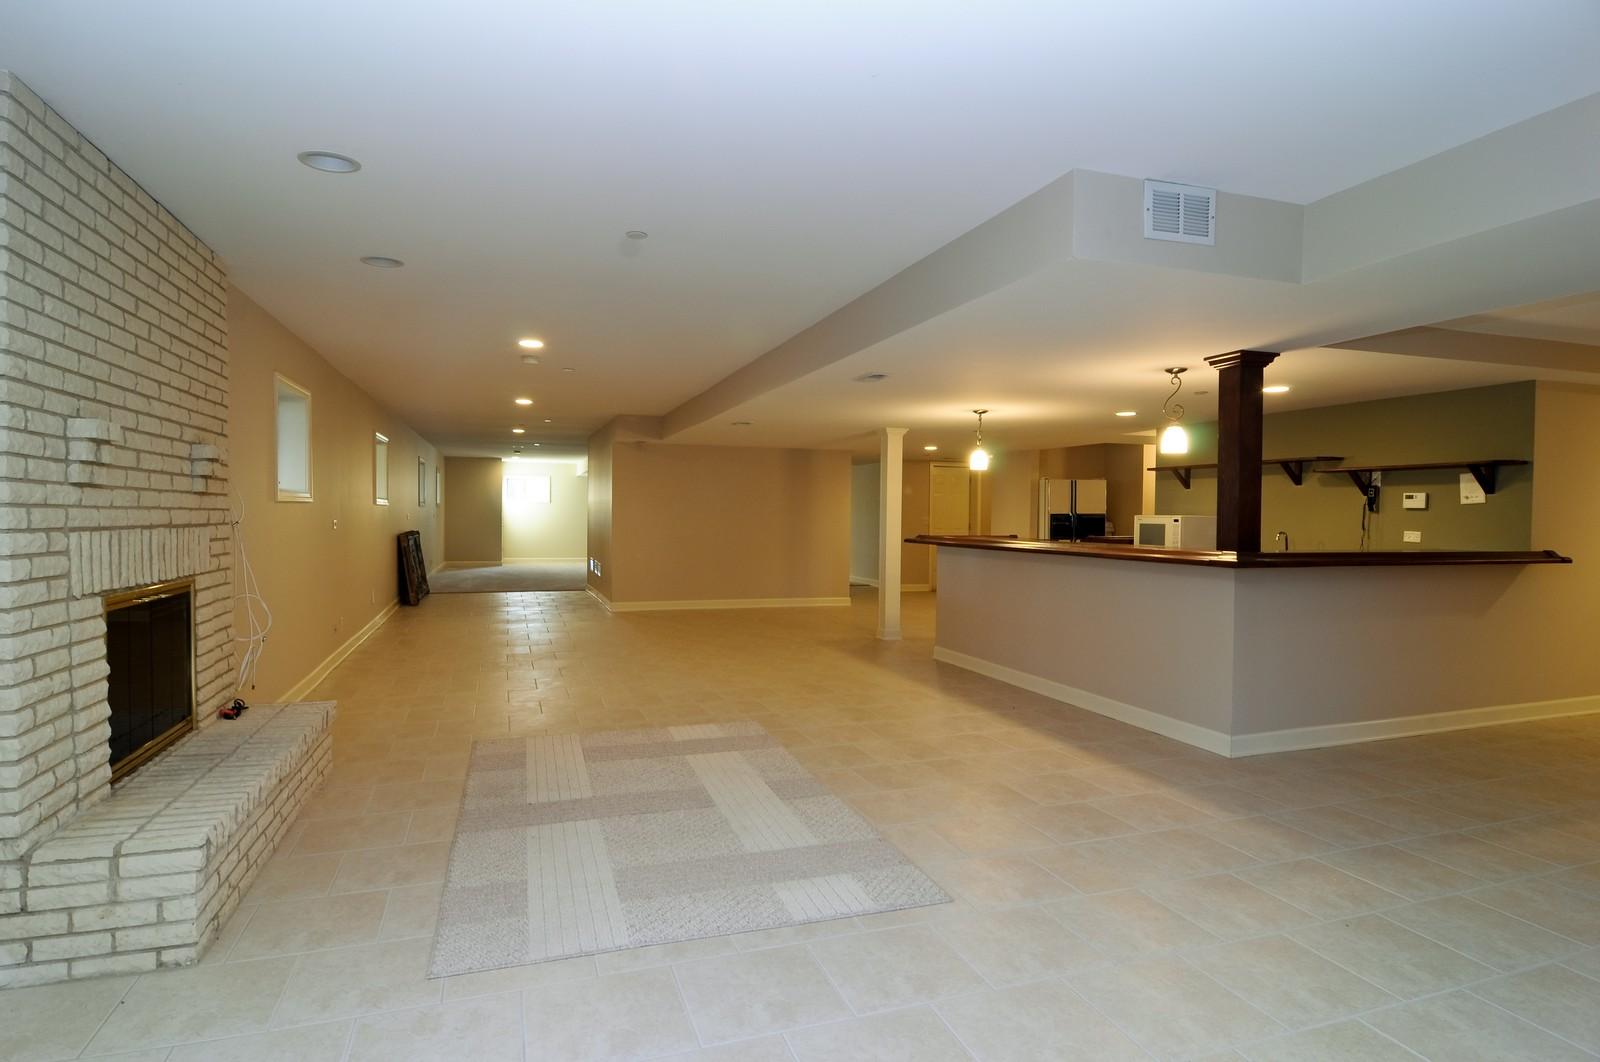 Real Estate Photography - 1181 Fairview Ln, Long Grove, IL, 60047 - Basement